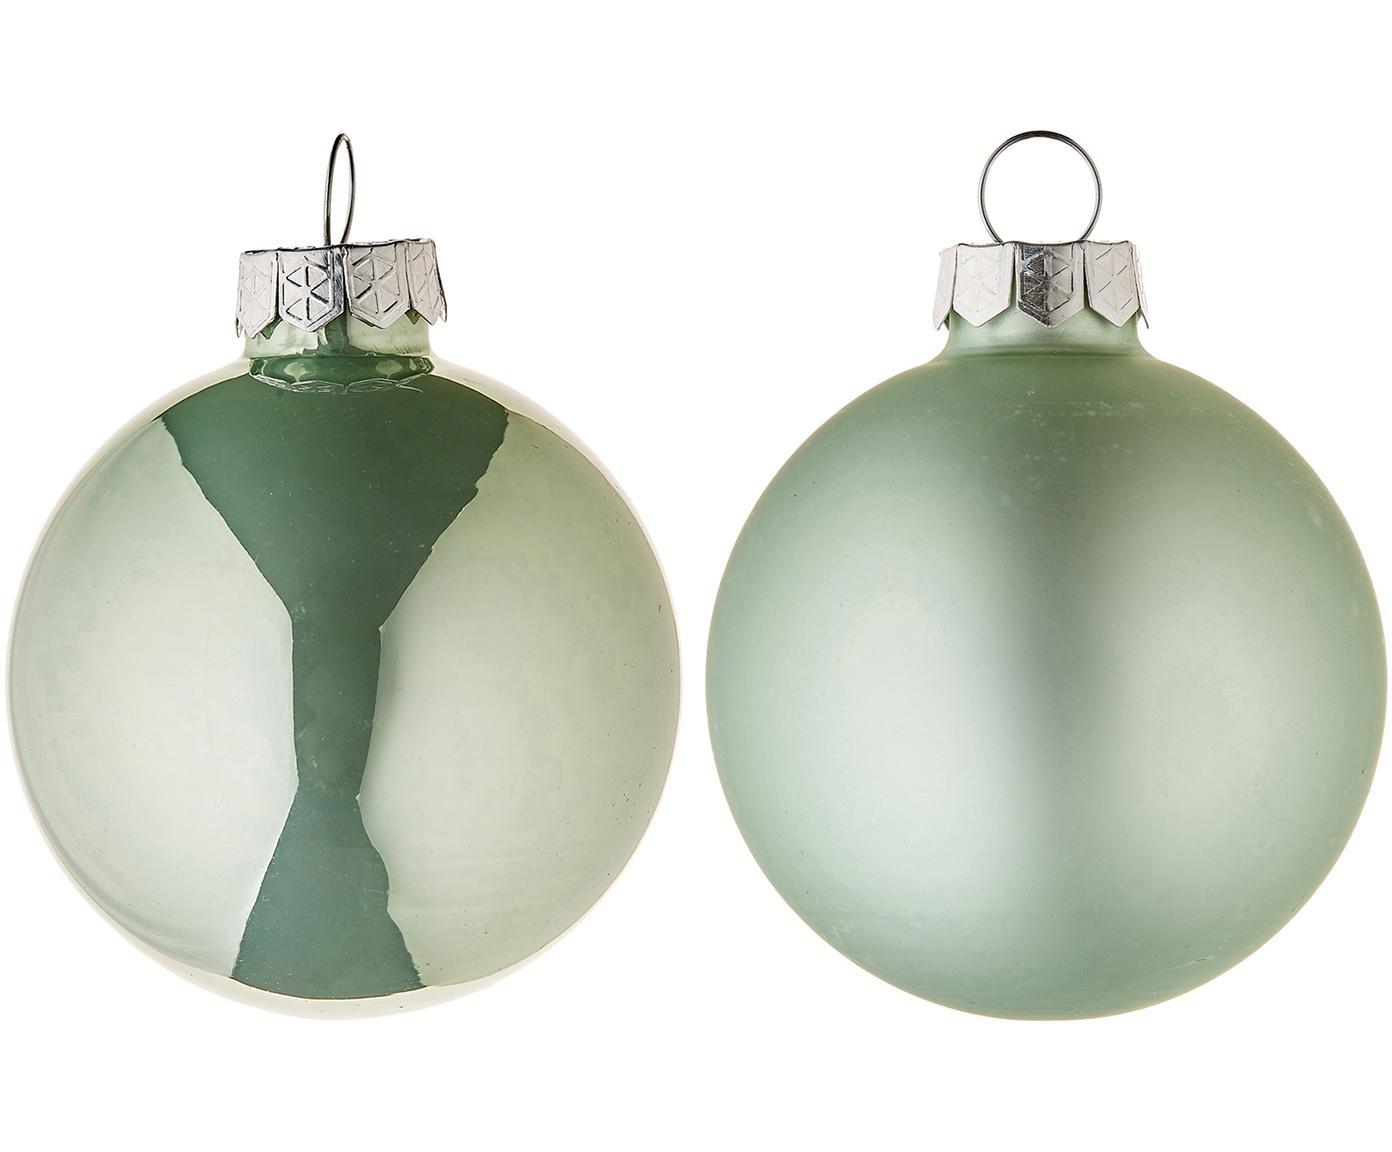 Kerstballenset Evergreen, 10-delig, Groen, Ø 6 cm